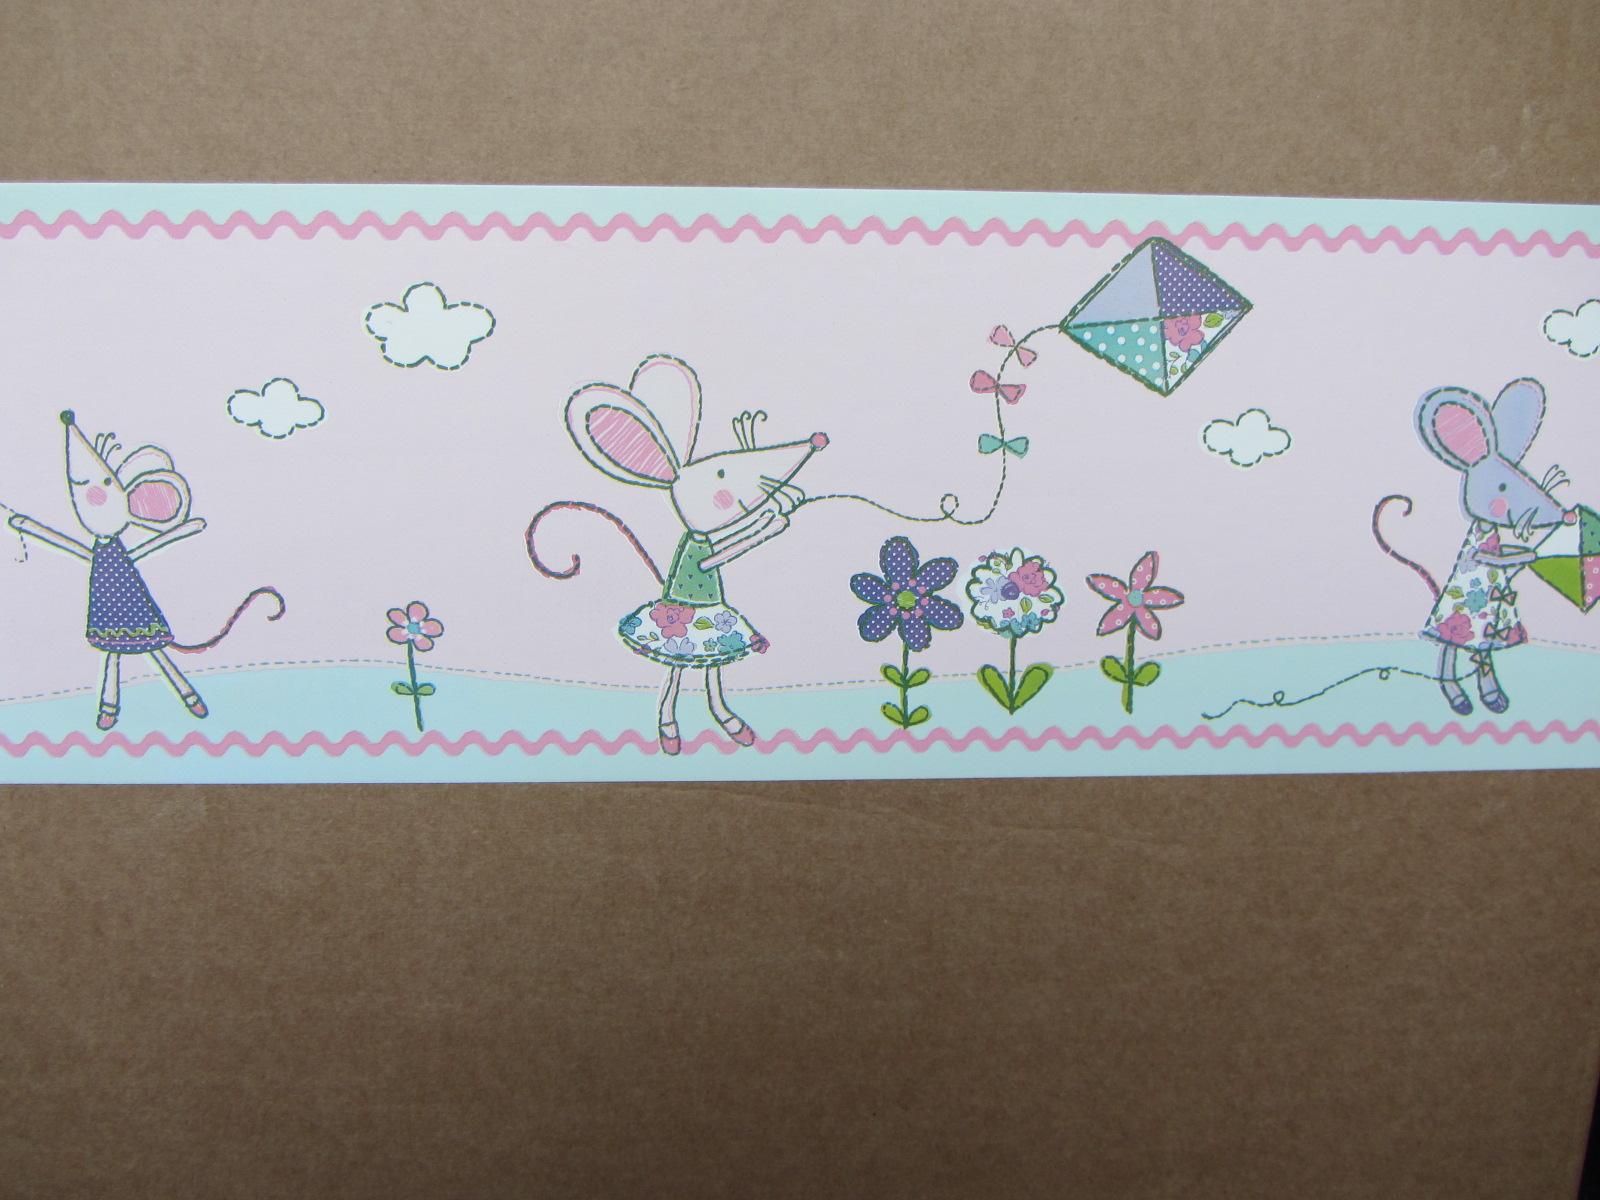 Nursery Wallpaper Borders Uk 1600x1200